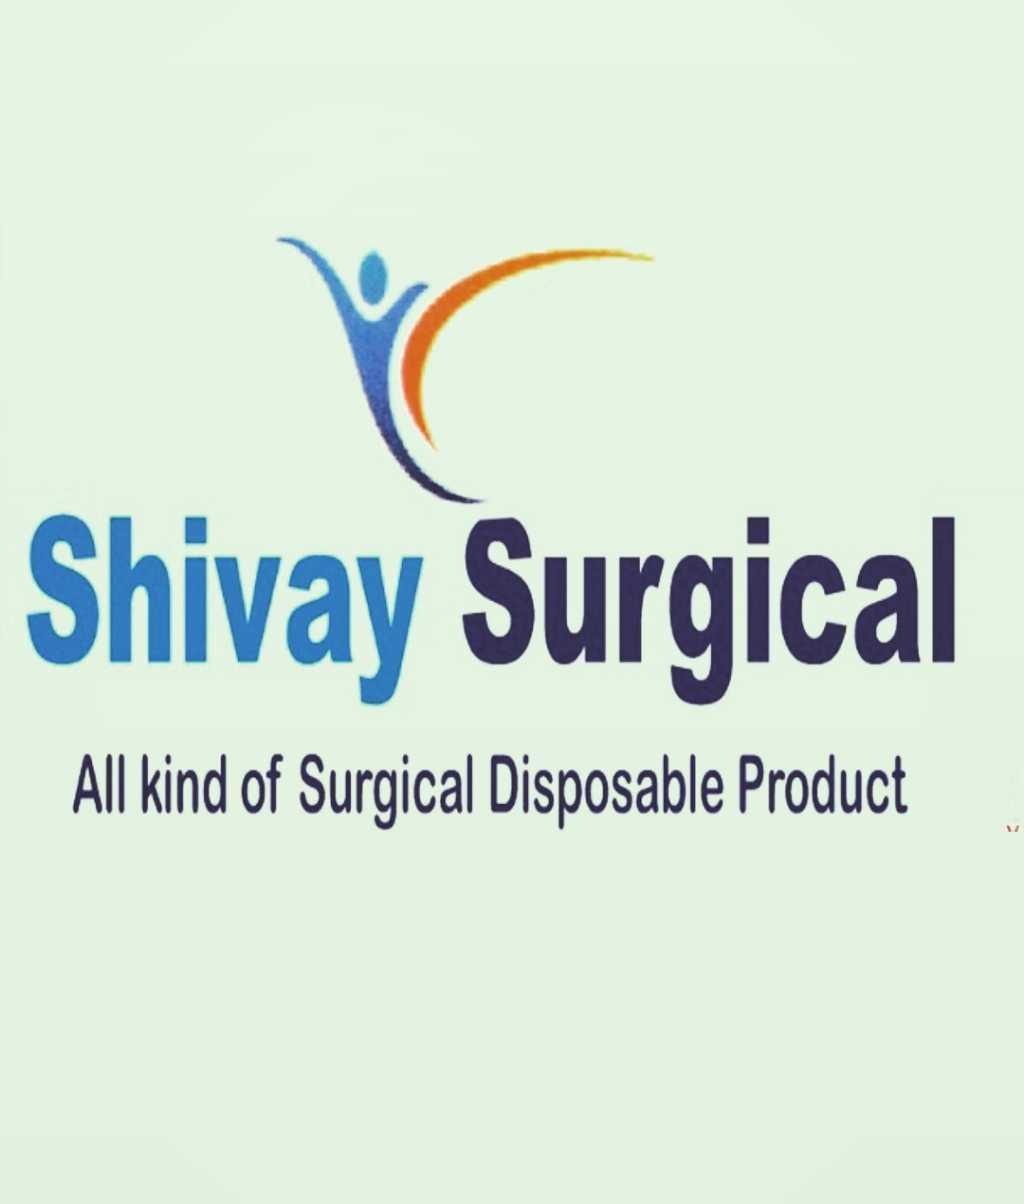 SHIVAY SURGICAL